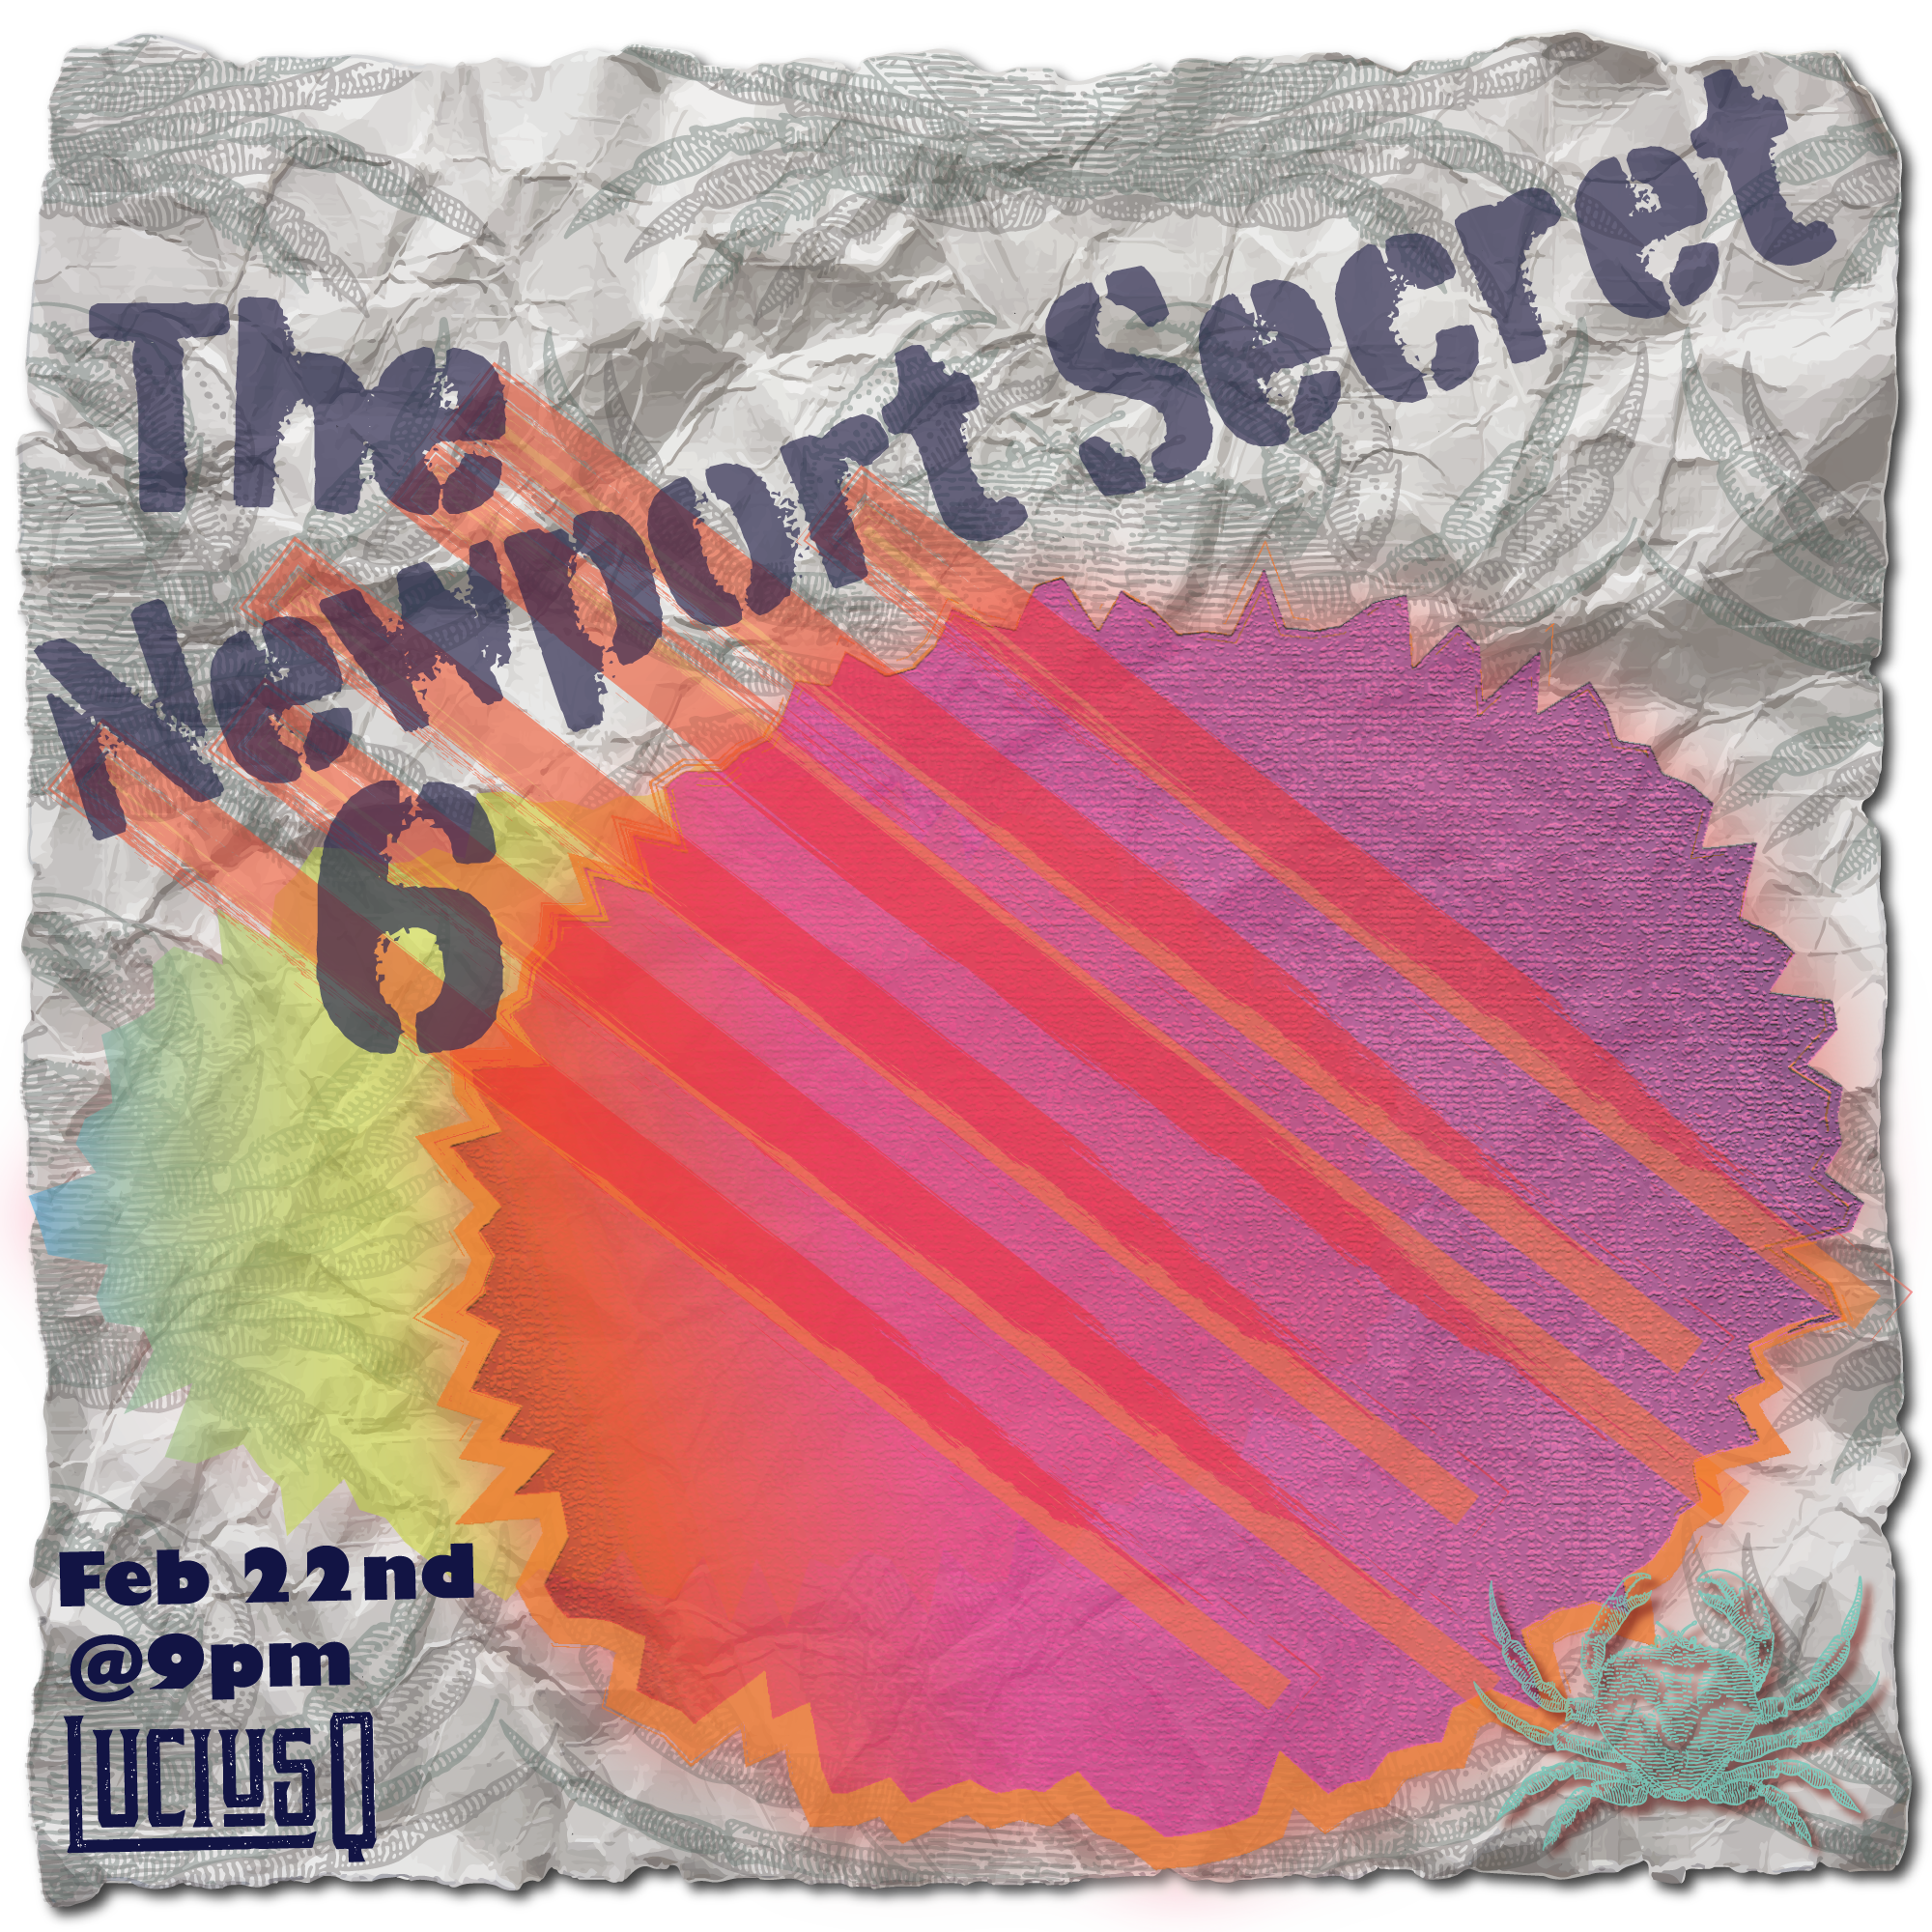 FiR-Creative---LuciusQ---NewportSecretSixFinal.png